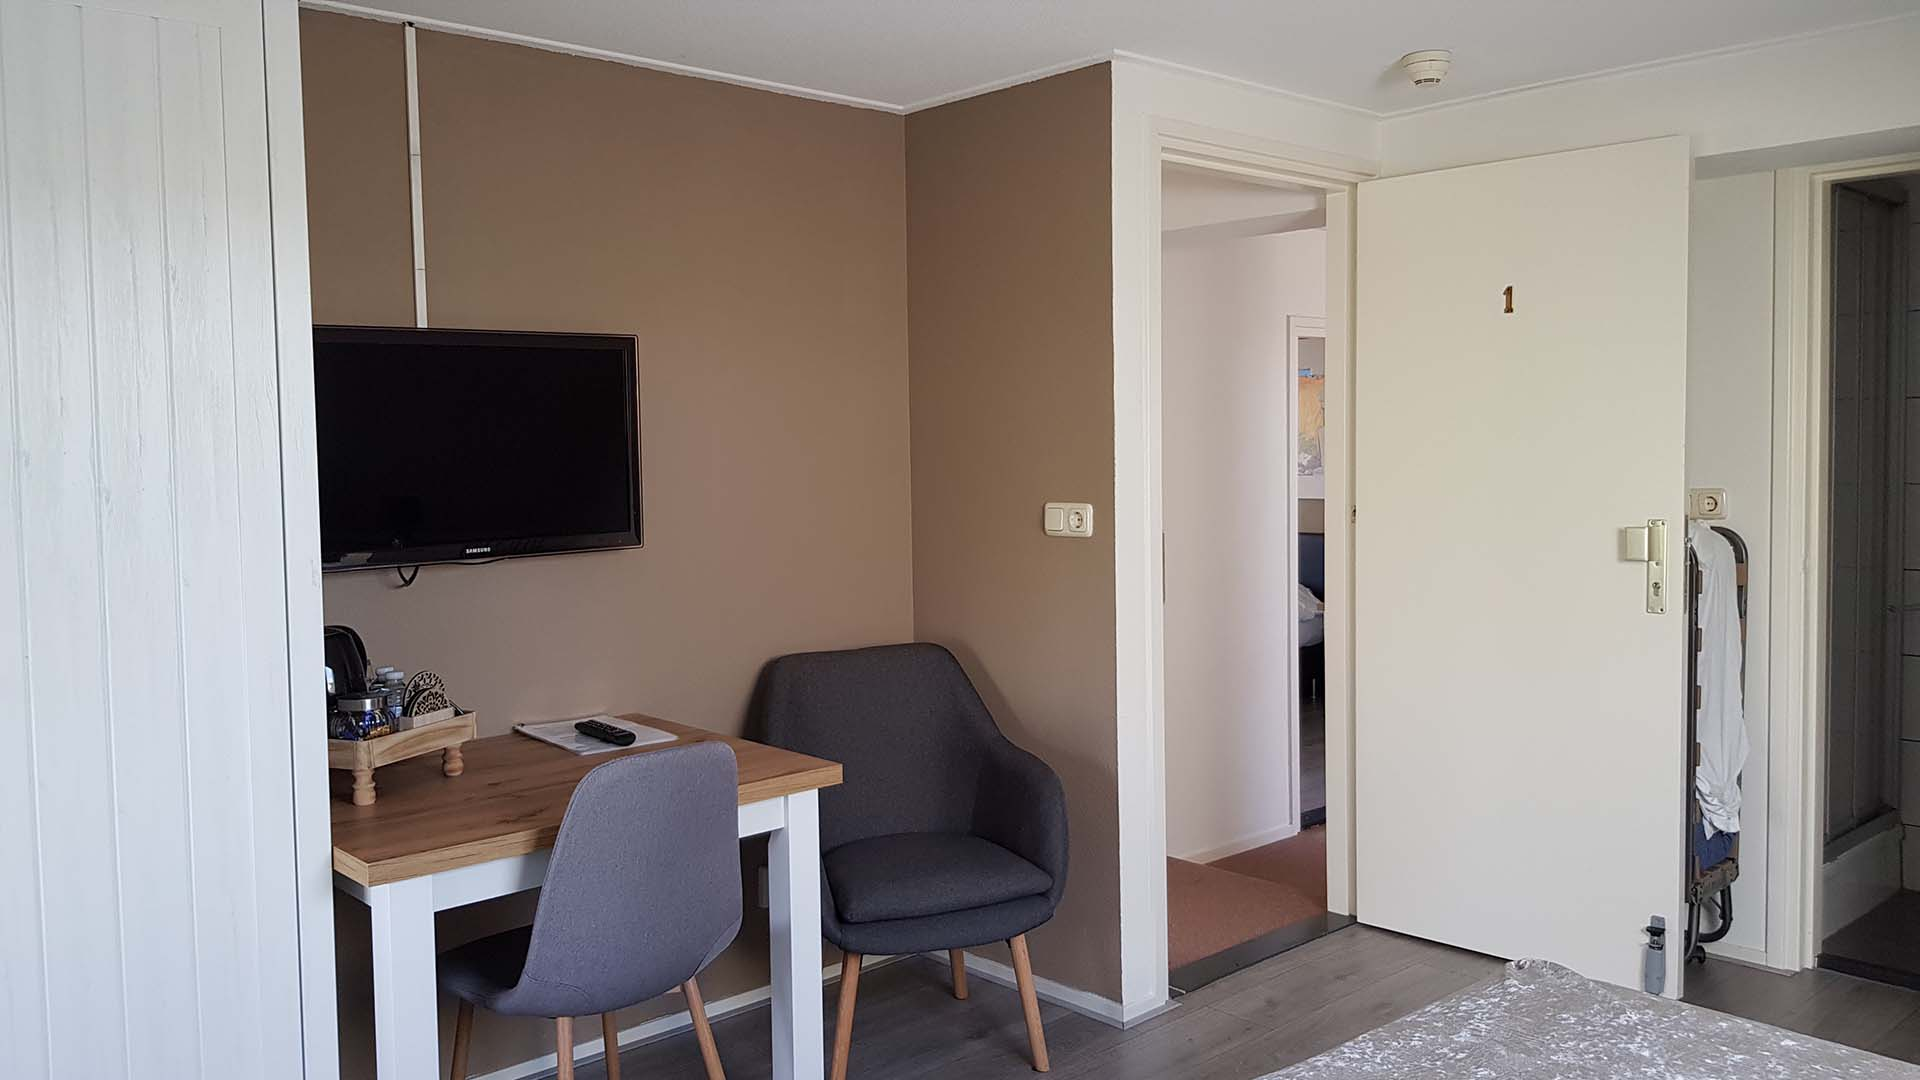 kamer 1 bureau en televisie B&B Plompetorenzicht Burg-Haamstede Zeeland